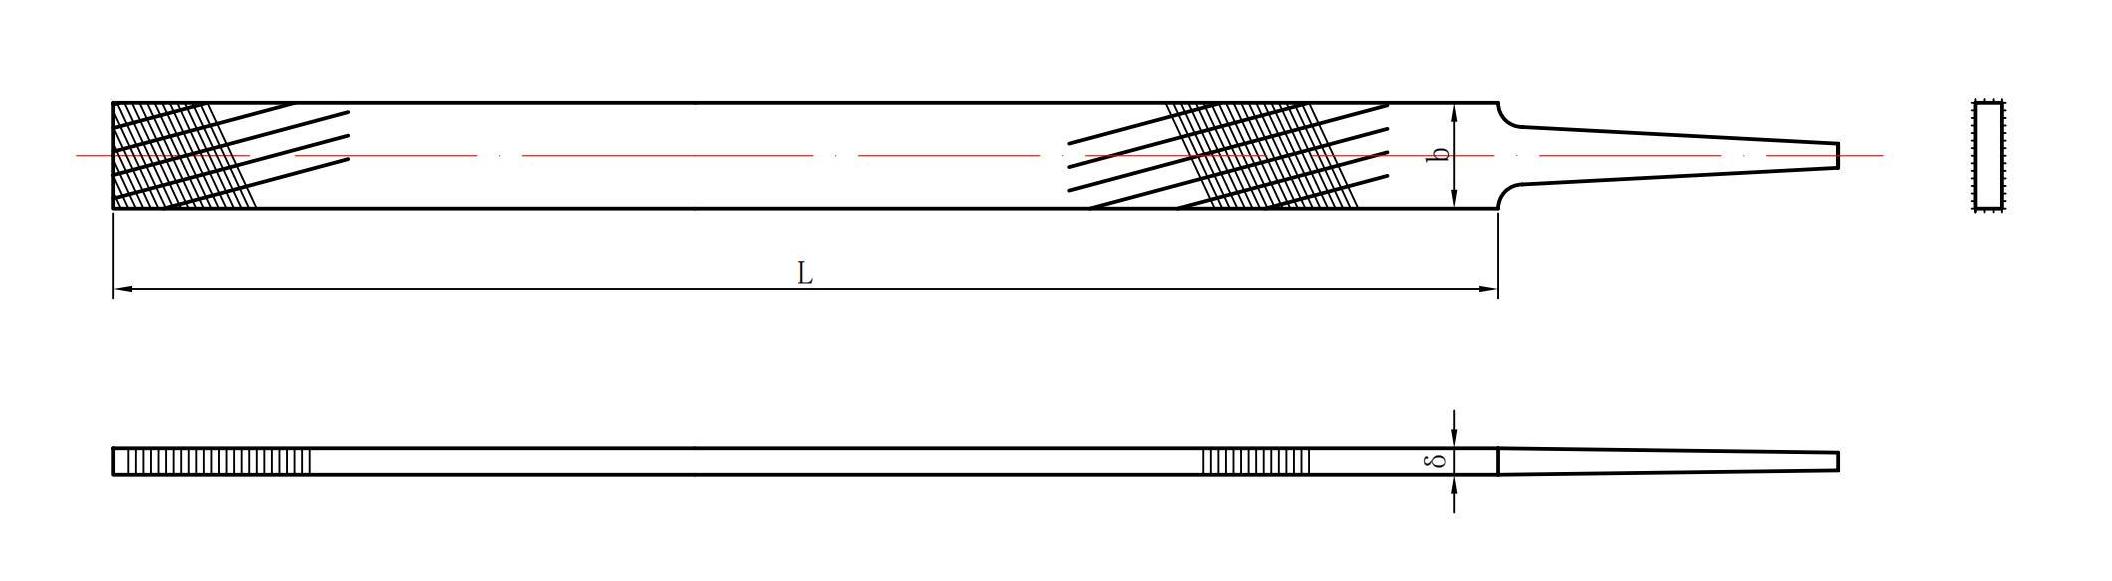 Single groove soft metal file